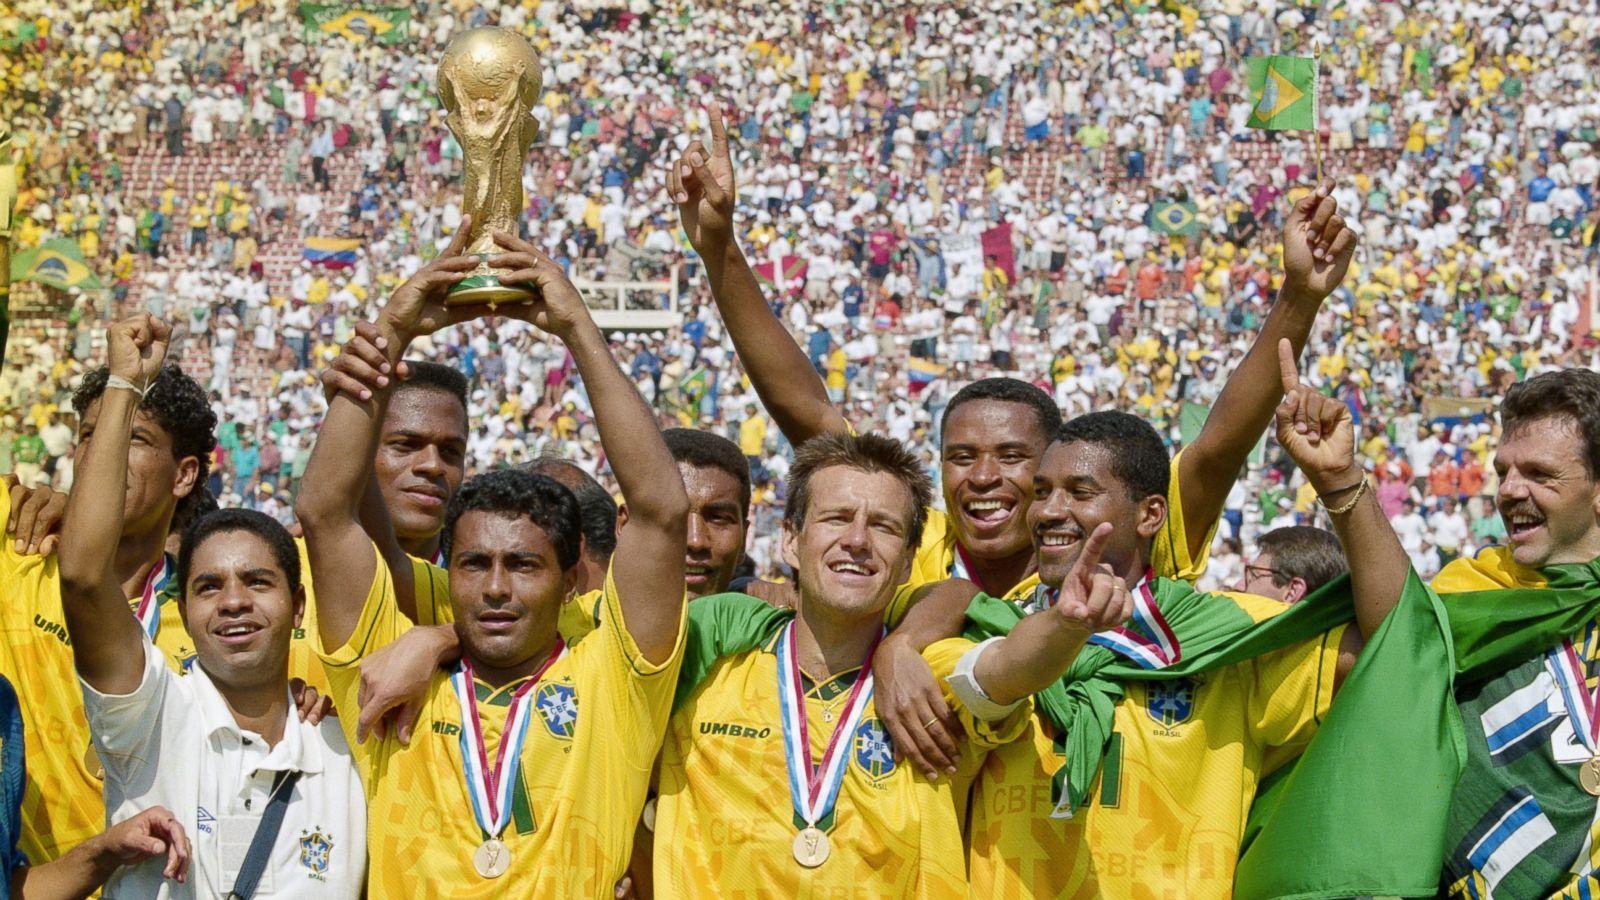 1994 FIFA World Cup Winner - Brazil